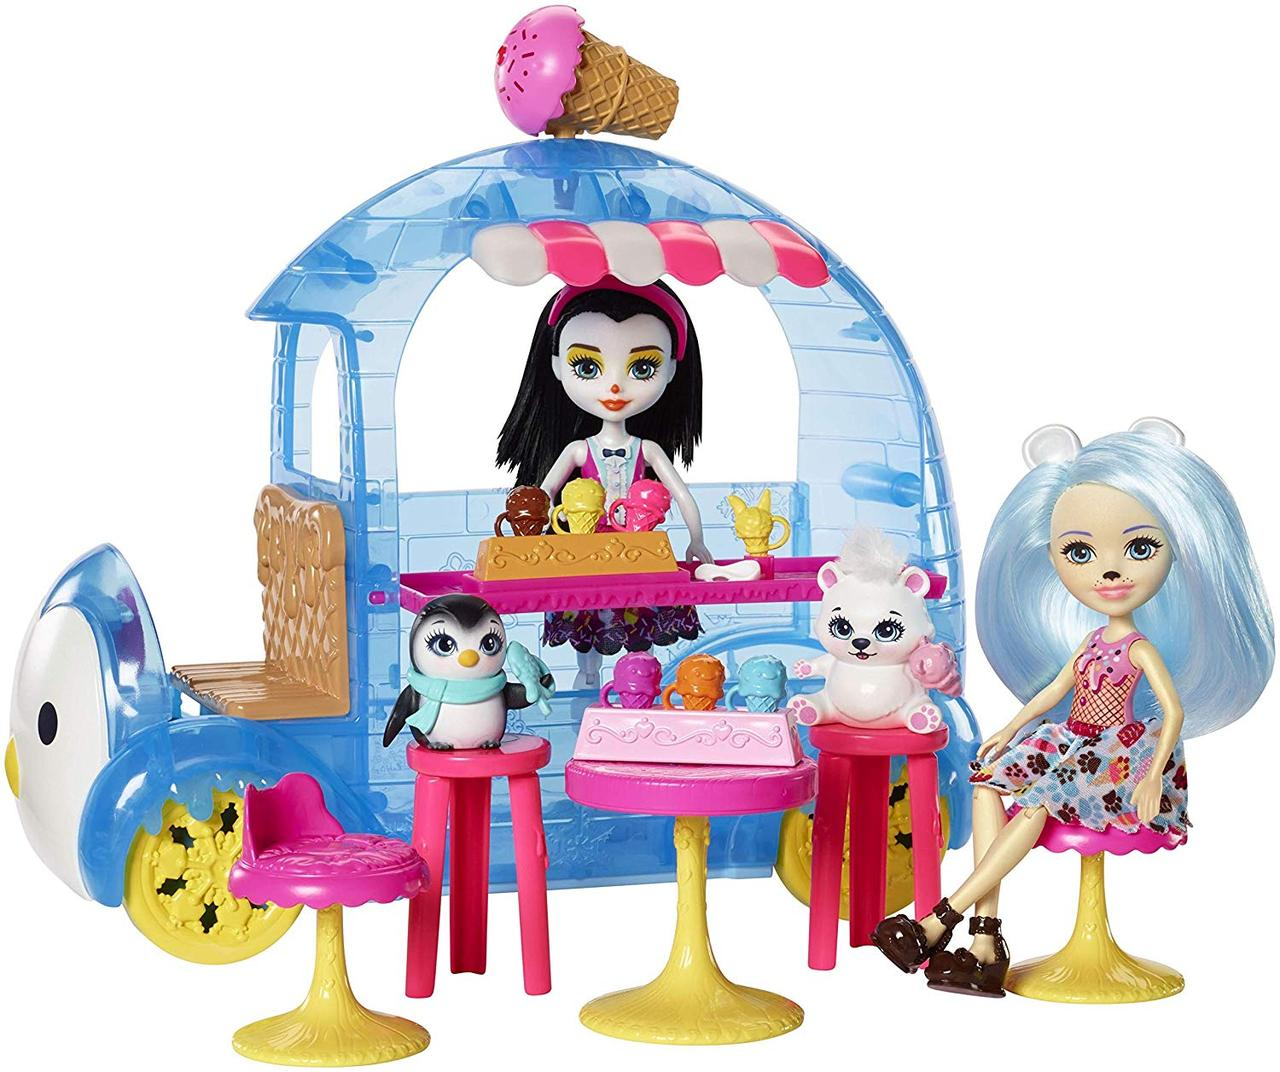 Enchantimals. Wheel Frozen Treats: Preena Penguin & Jayla and Polar Bear (Энчантималс. Фургон с мороженным.)